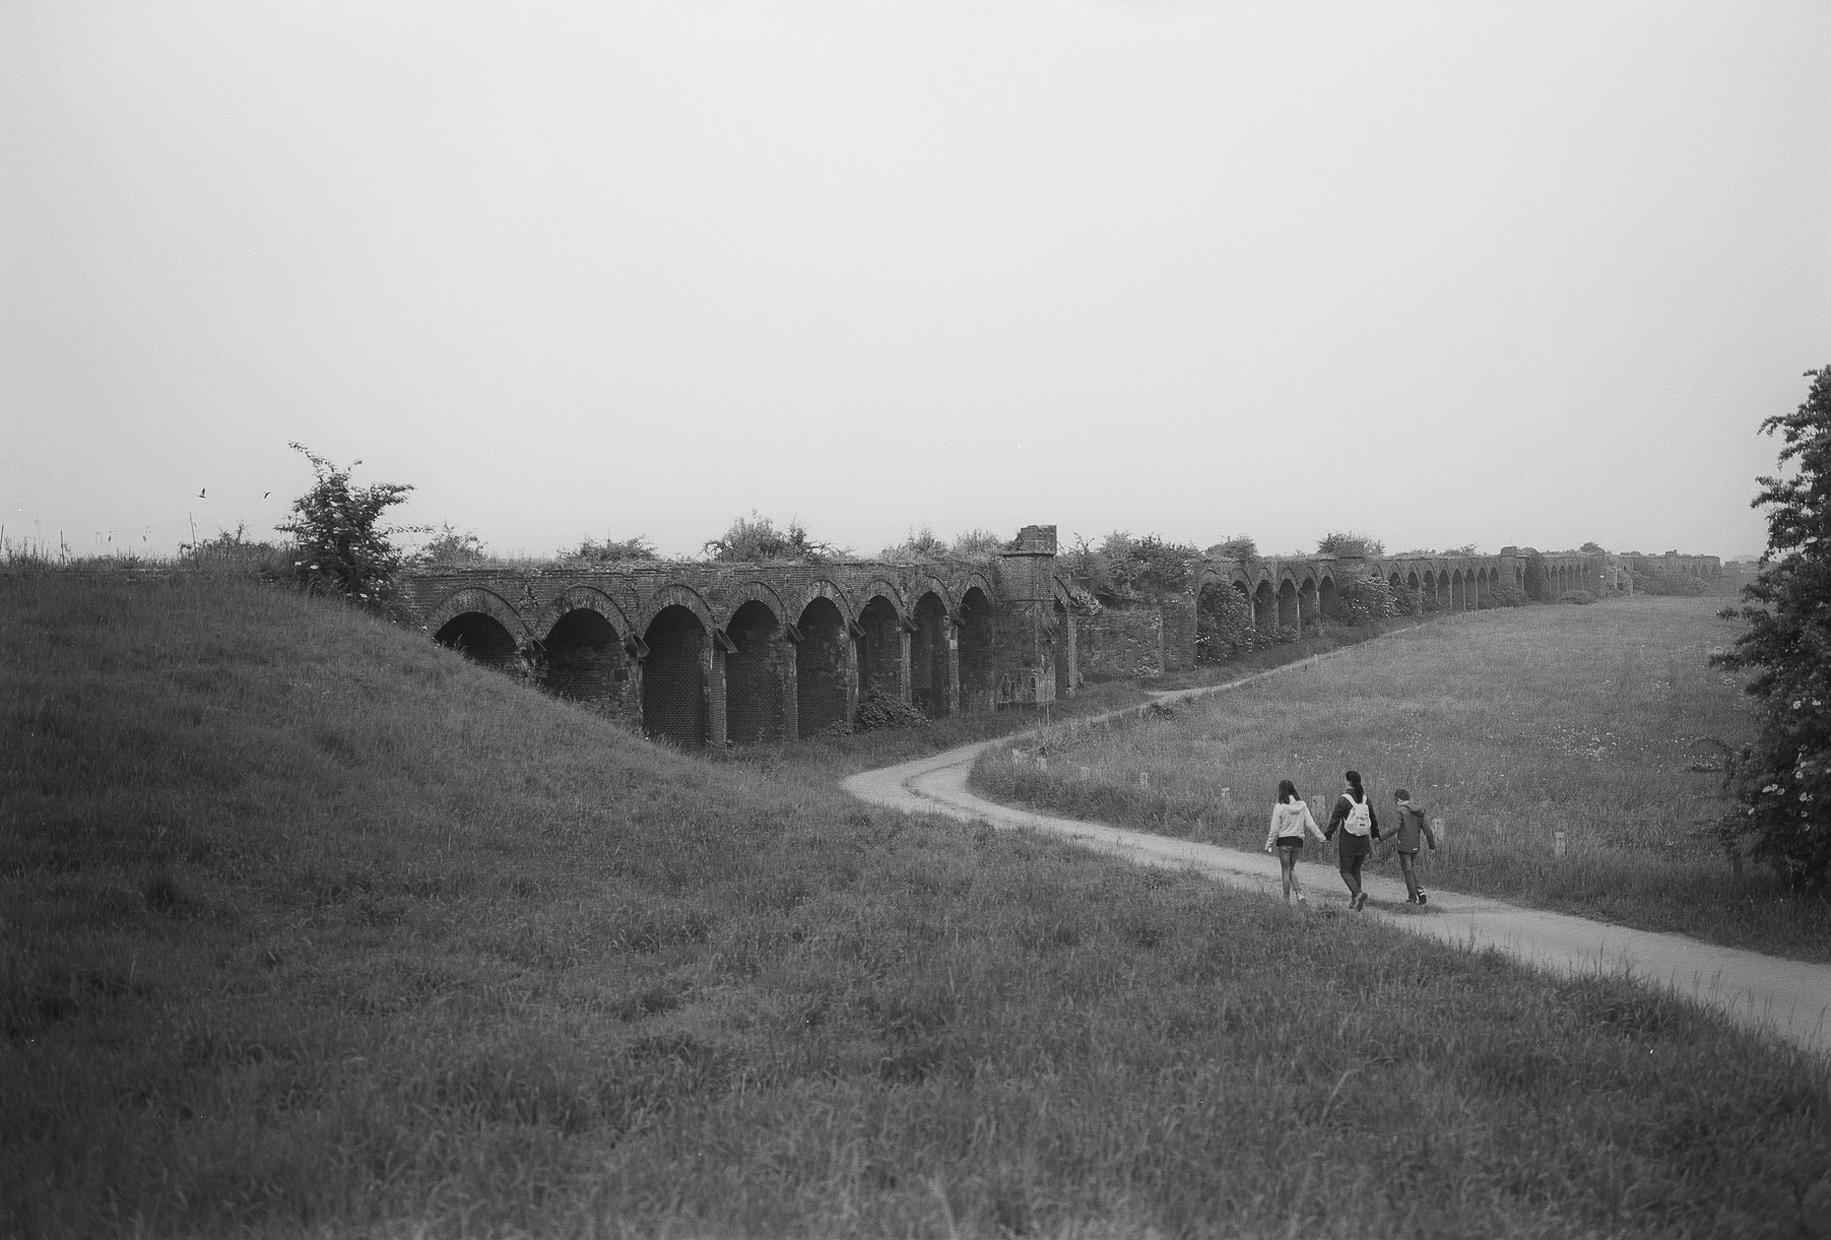 Germany, old Rhine bridge close to Wesel